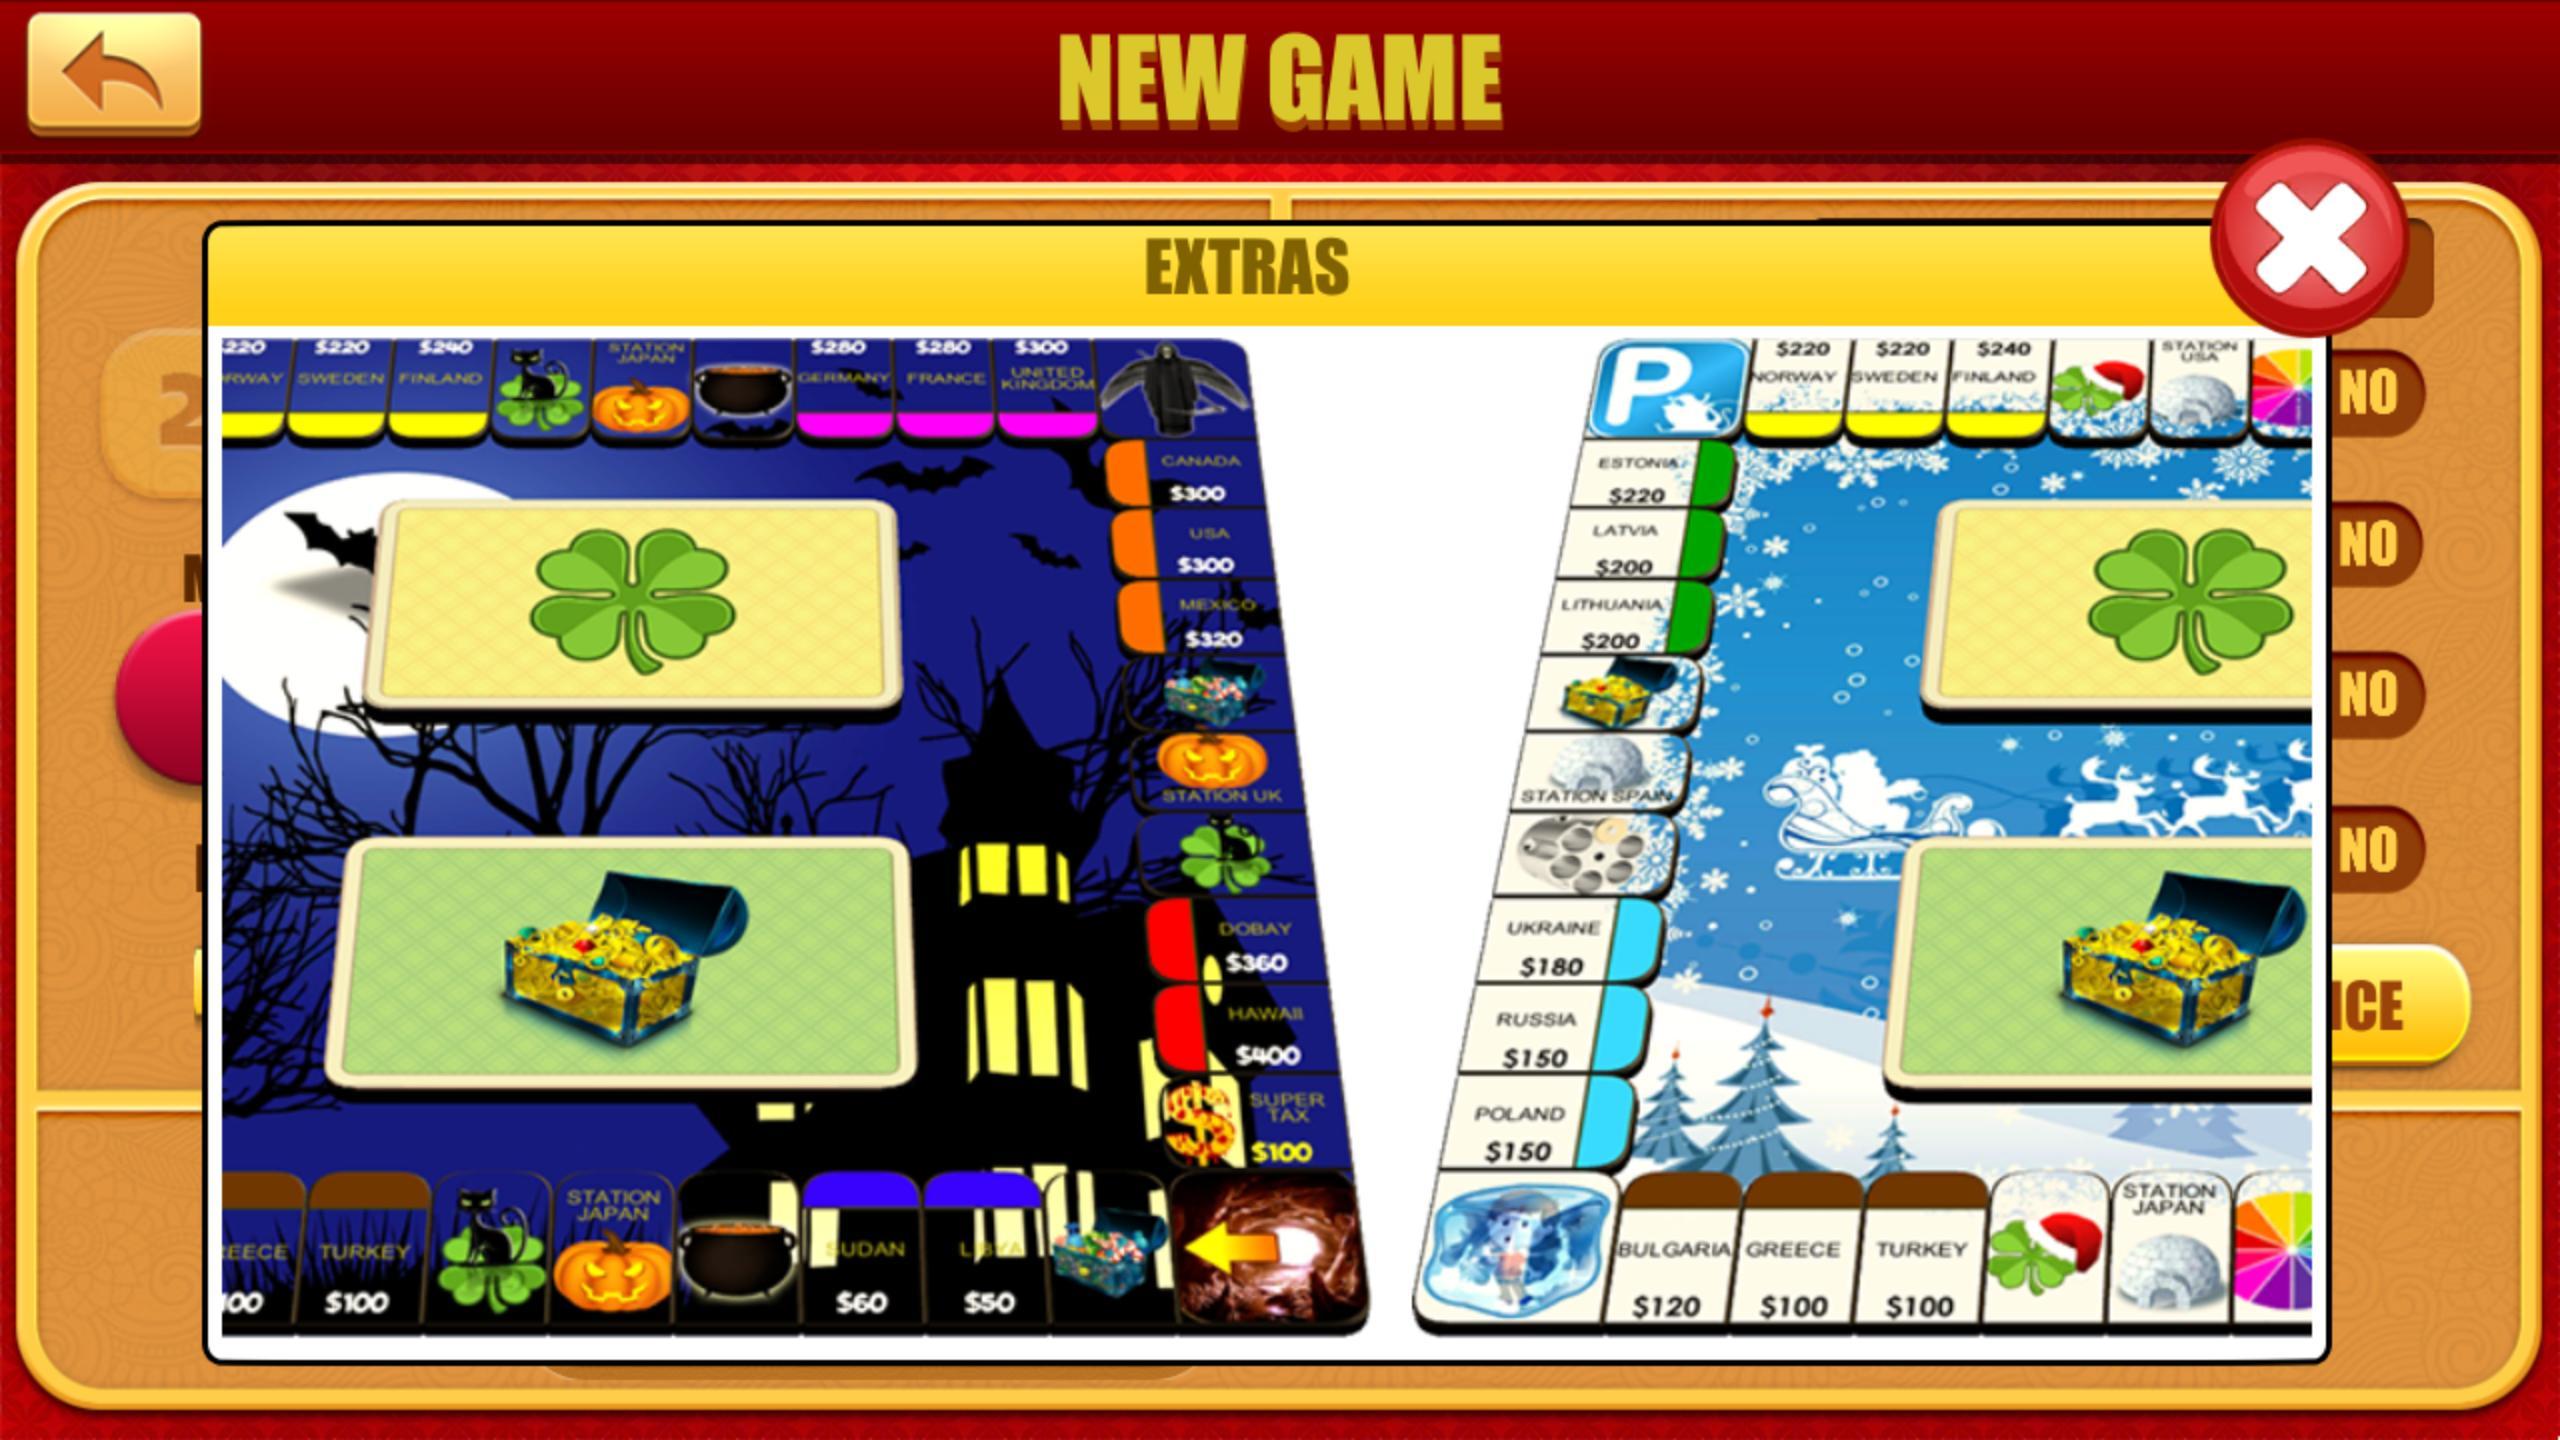 Rento Dice Board Game Online 5.1.9 Screenshot 16